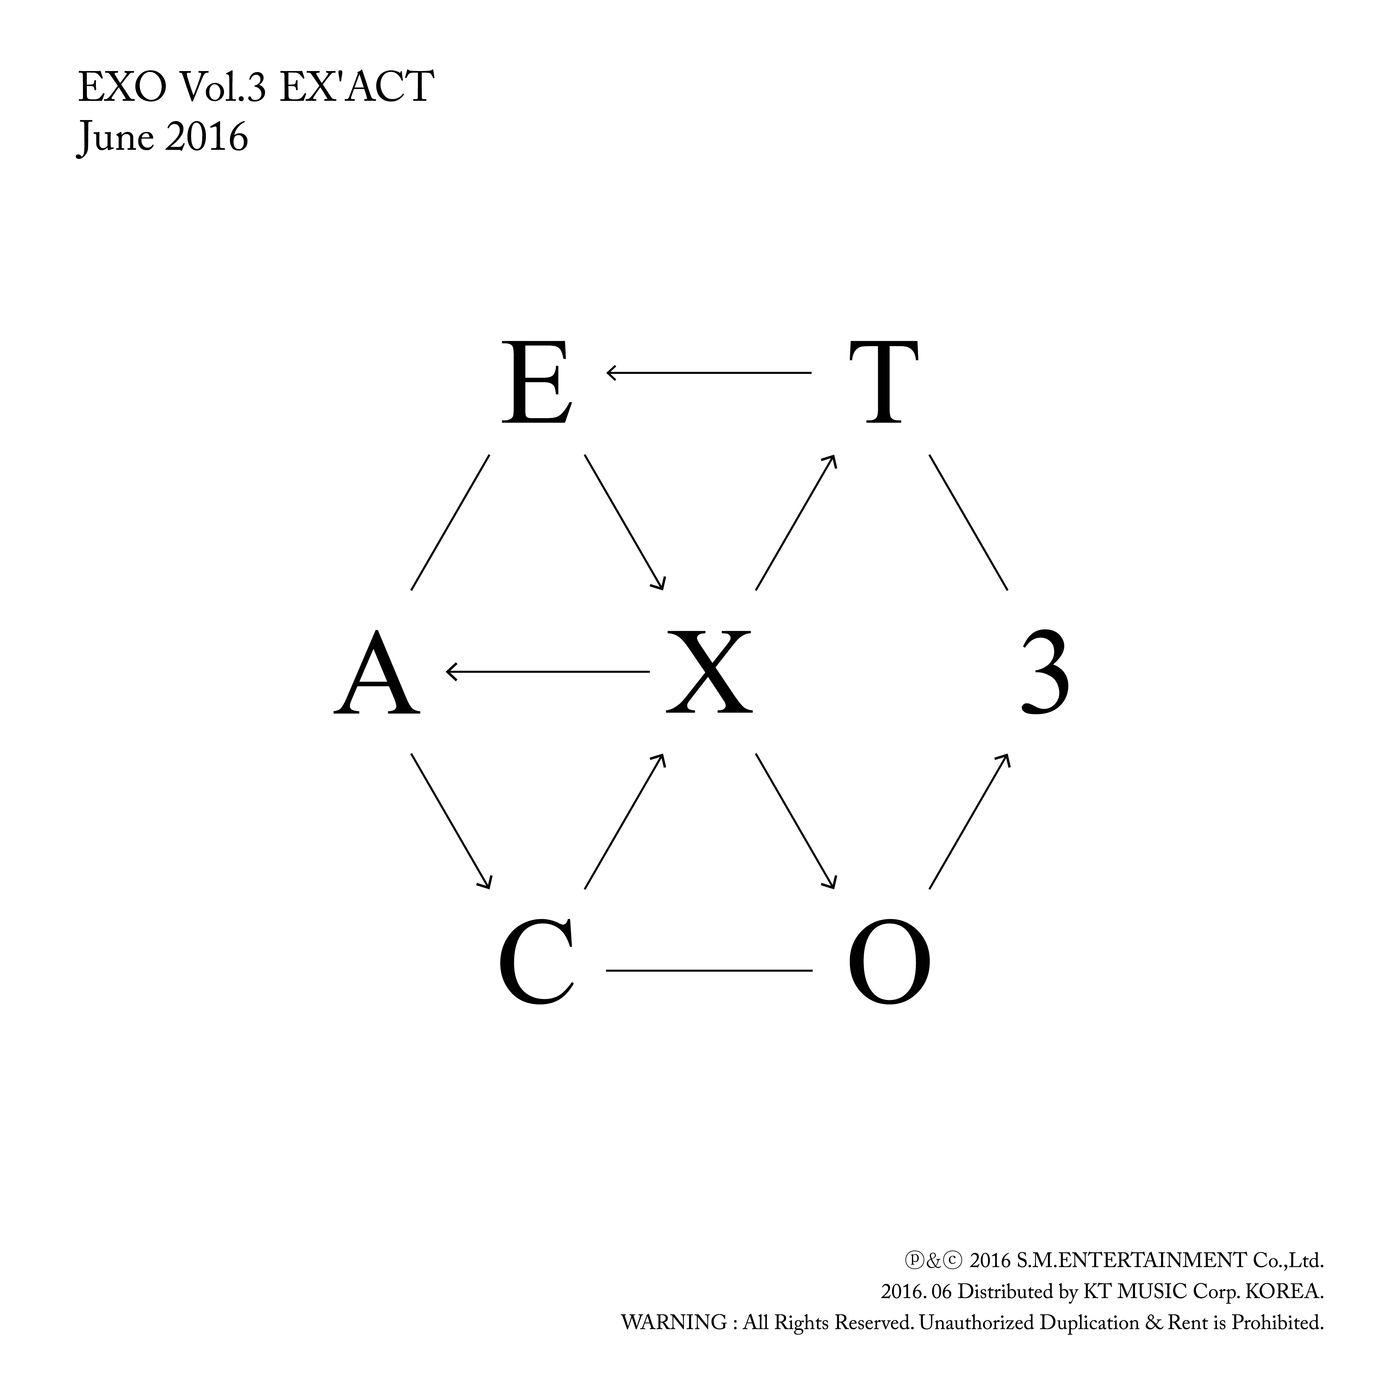 Album] EXO – EX'ACT – The 3rd Album (Korean + Chinese Version) | as